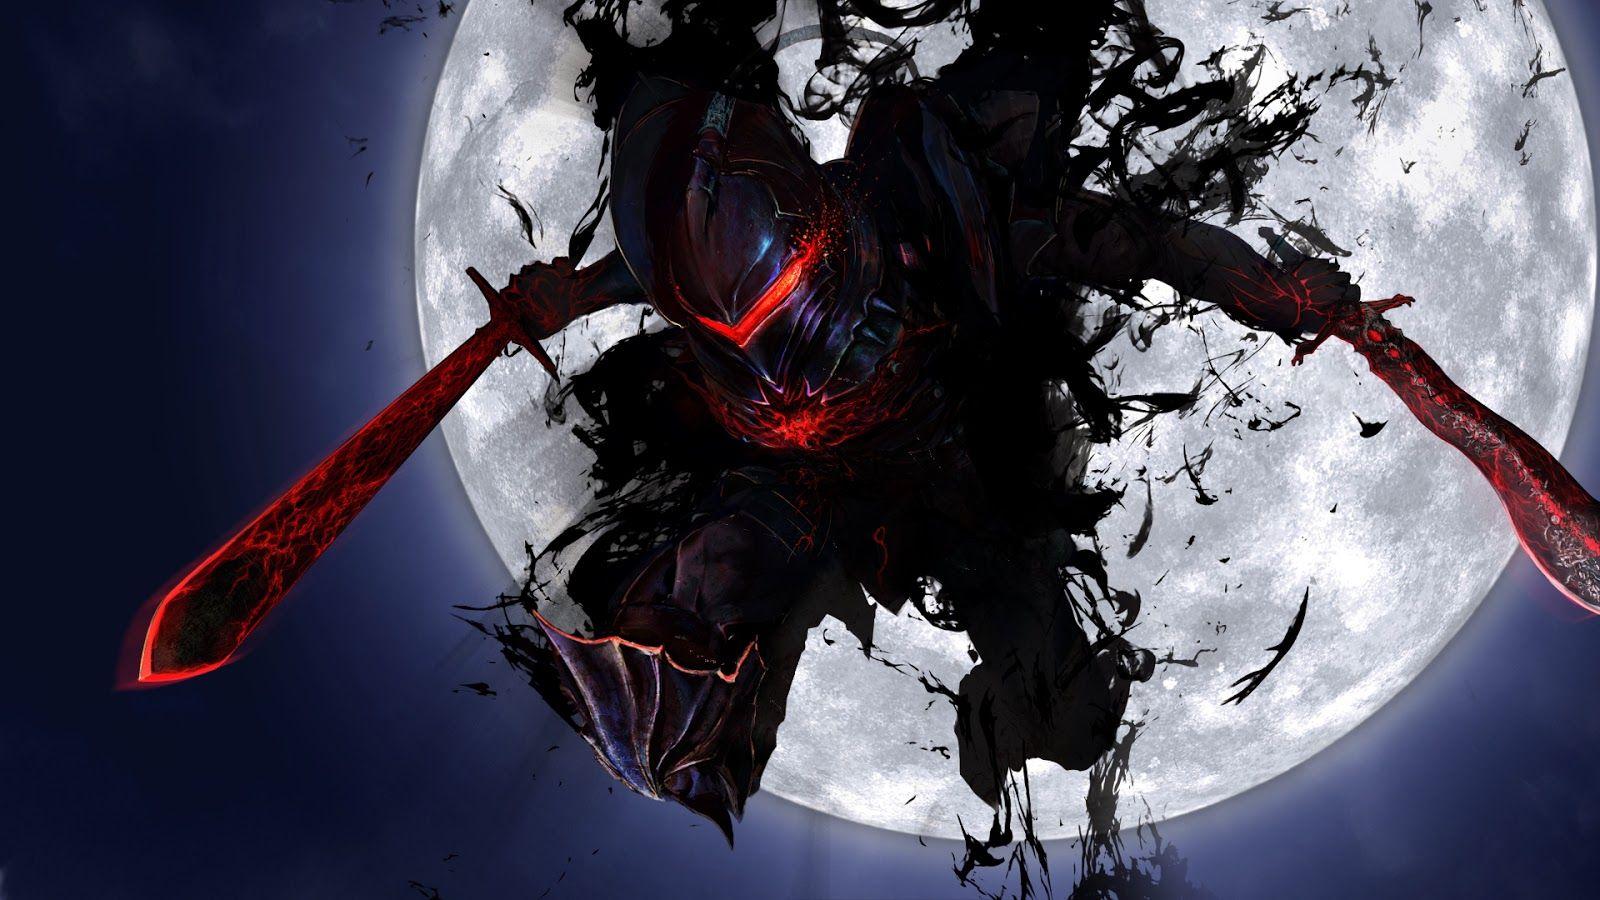 Berserker Fate Zero Anime a791 HD Wallpaper Hd anime